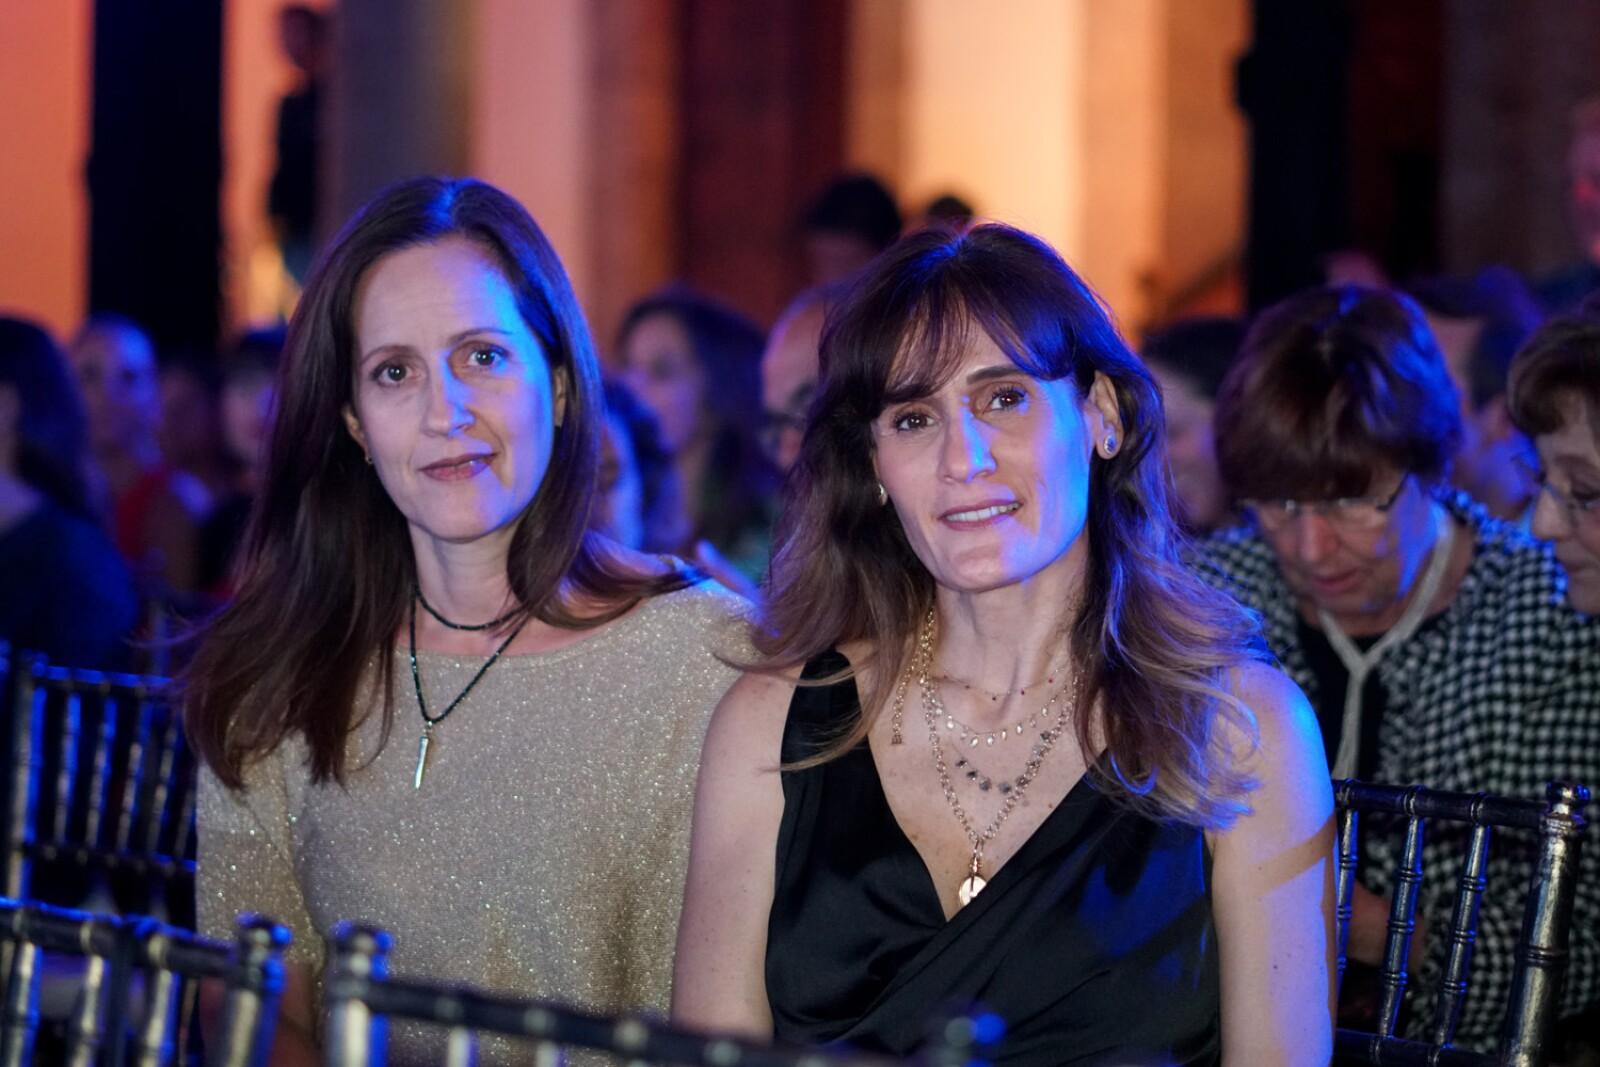 Cecilia Leopardi y Sheyra Ruiz.jpg